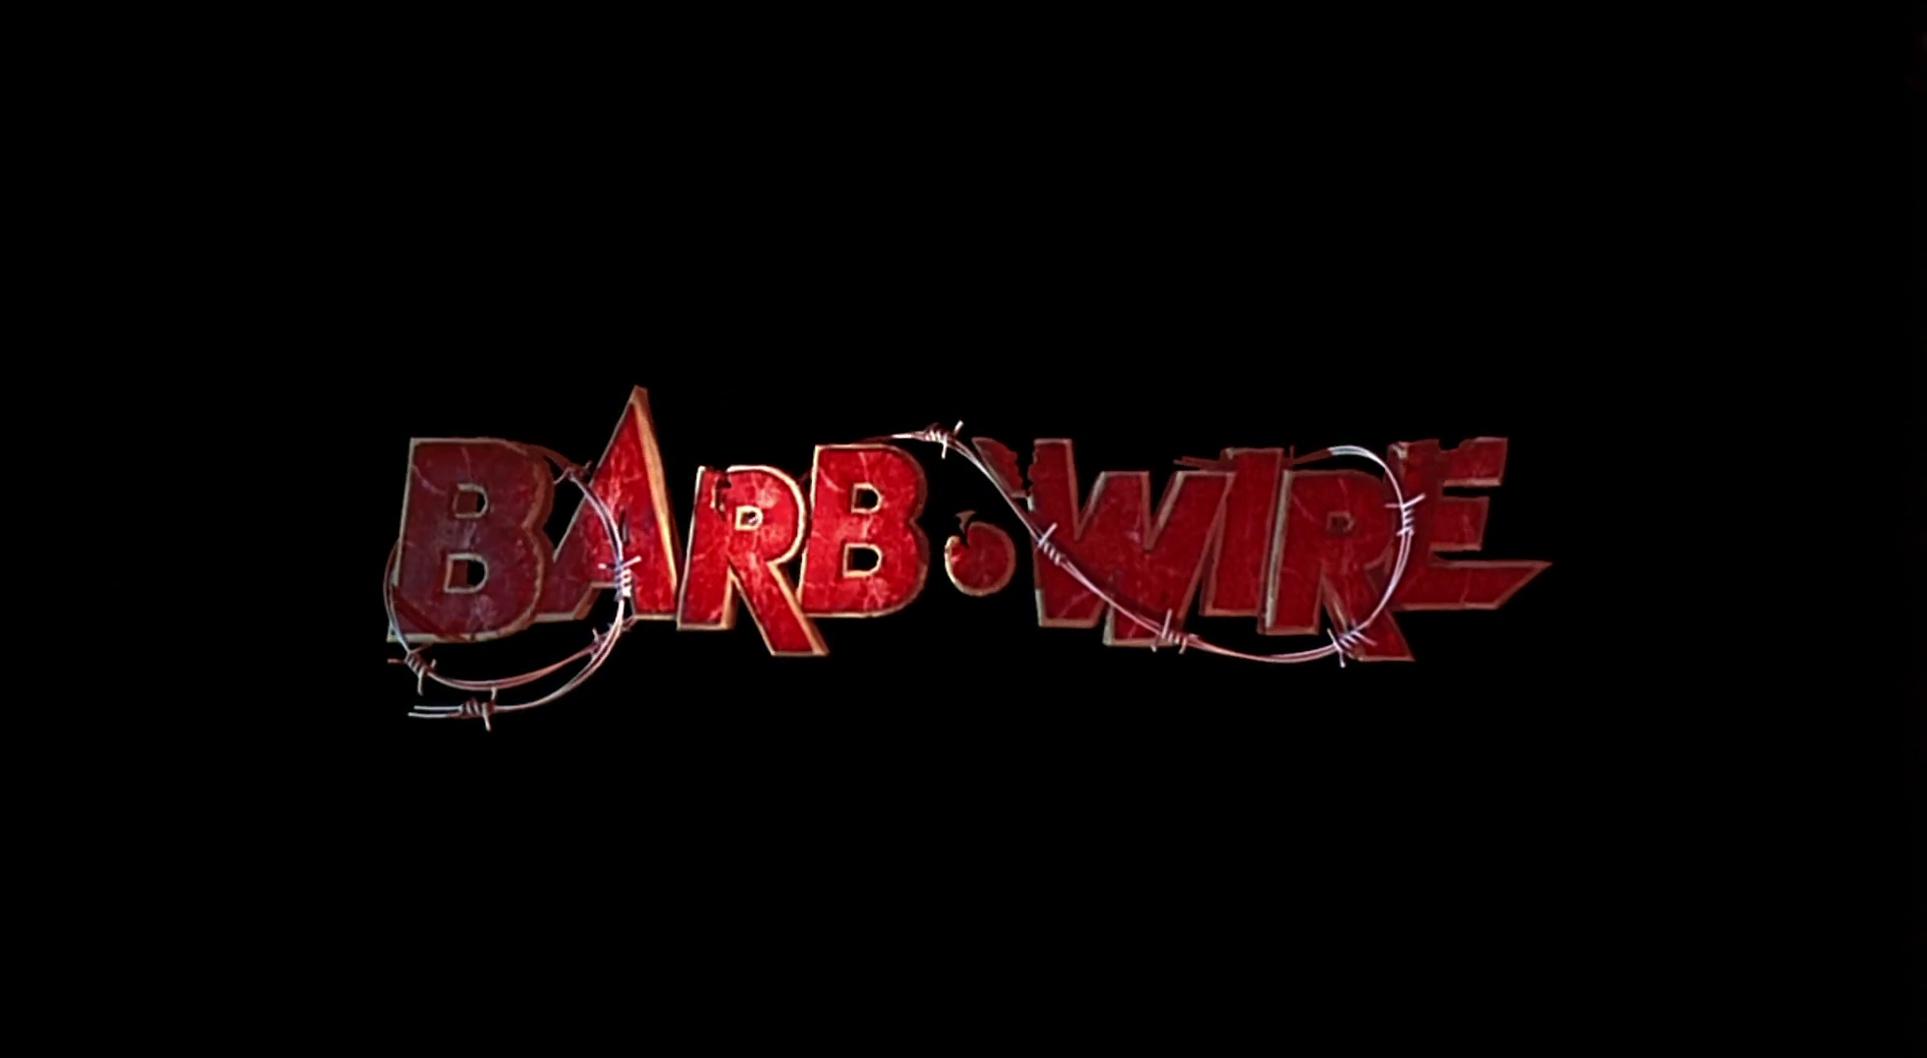 BARB WIRE de David Hogan (1996)